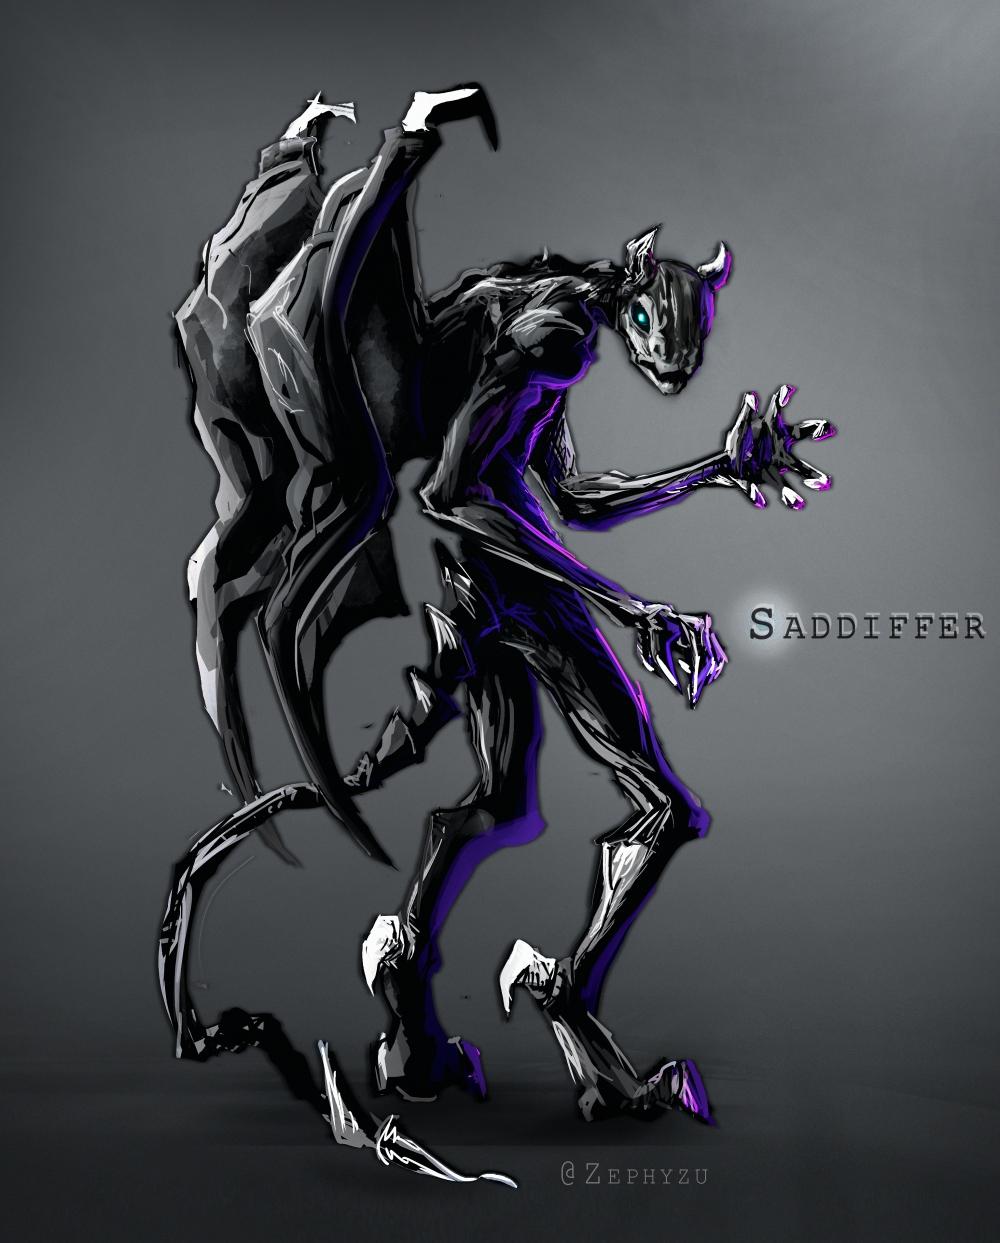 Saddiffer2